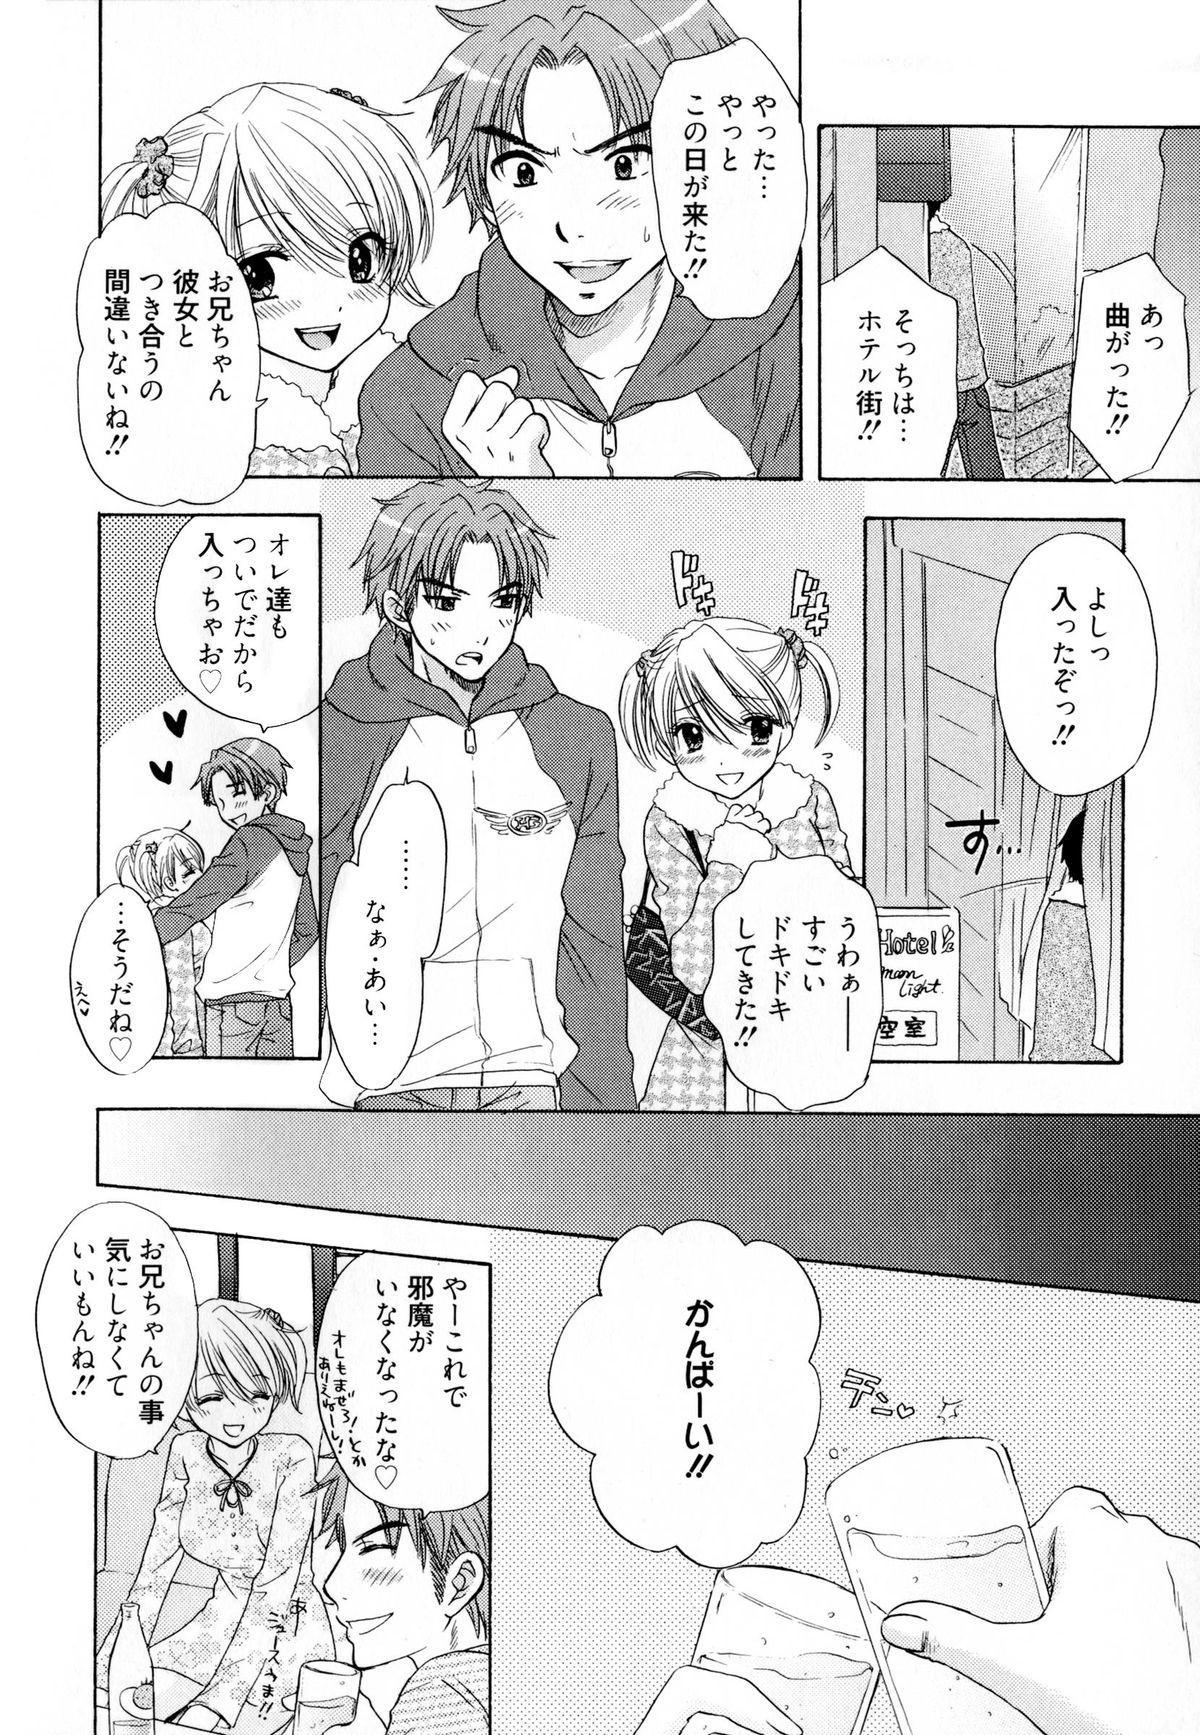 The Great Escape 4 Shokai Genteiban 23